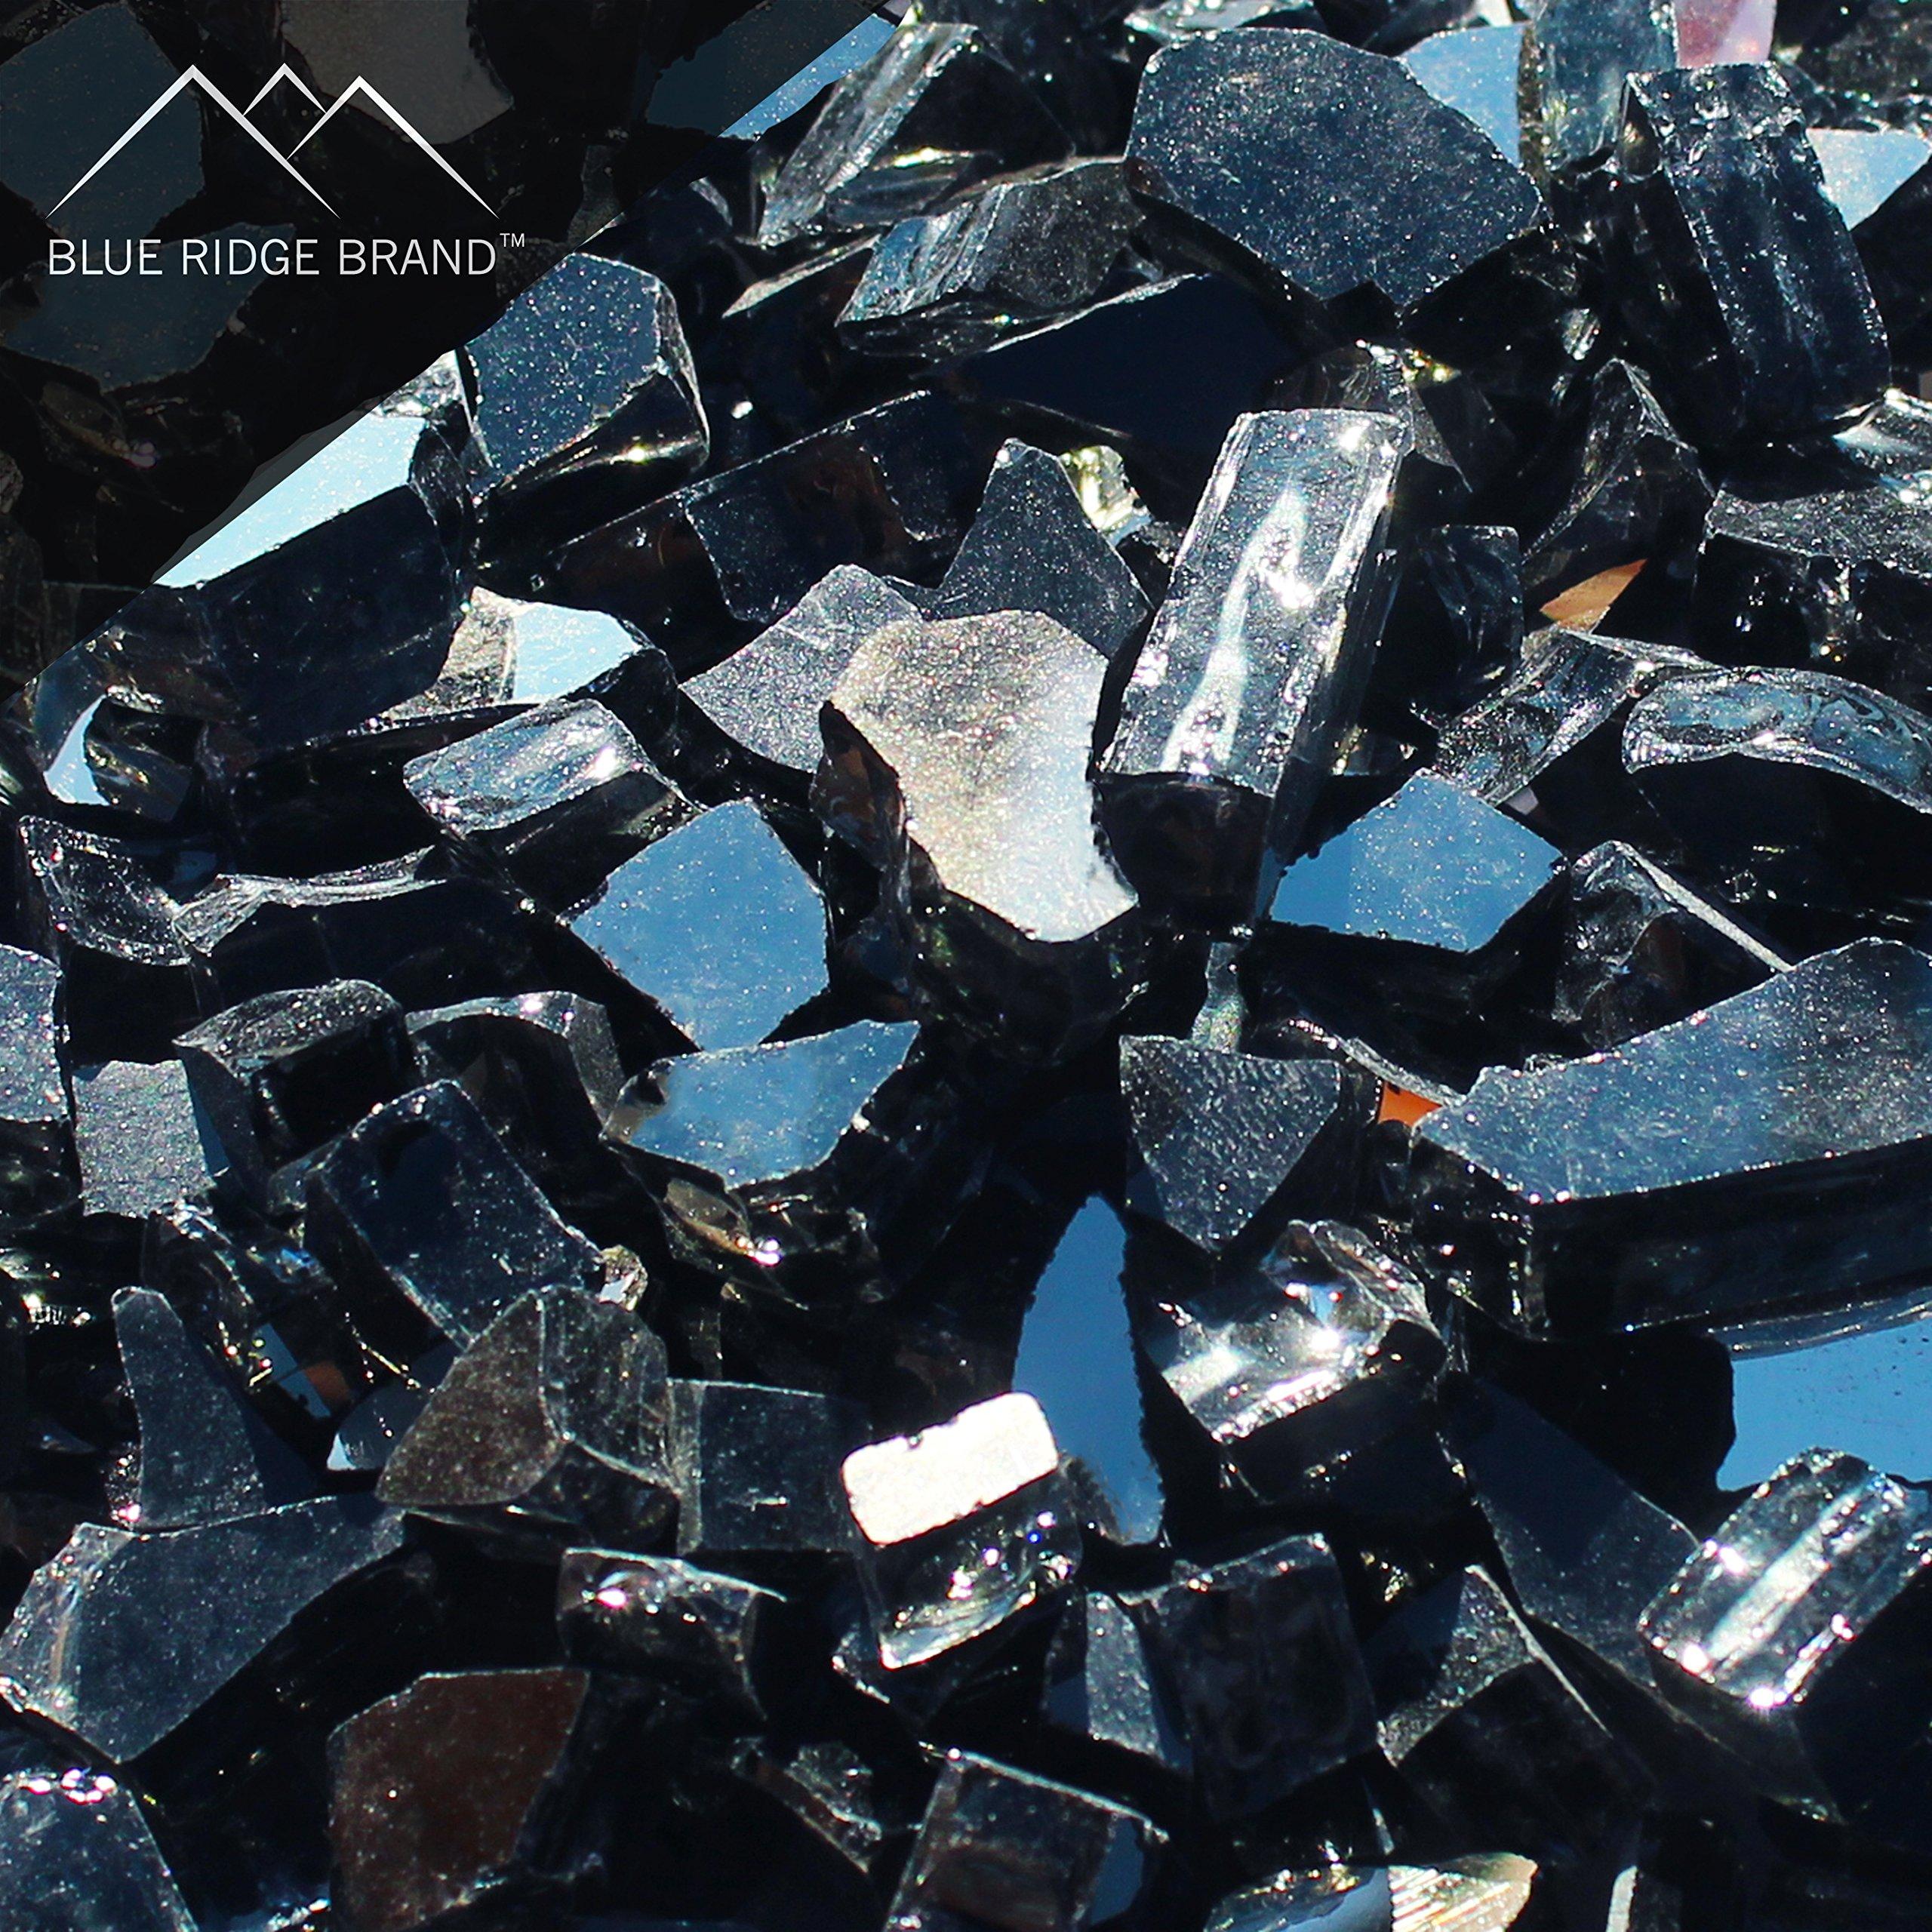 Blue Ridge Brand trade; Black Reflective Fire Glass - 5-Pound Professional Grade Fire Pit Glass - 1/2'' Reflective Glass for Fire Pit and Landscaping